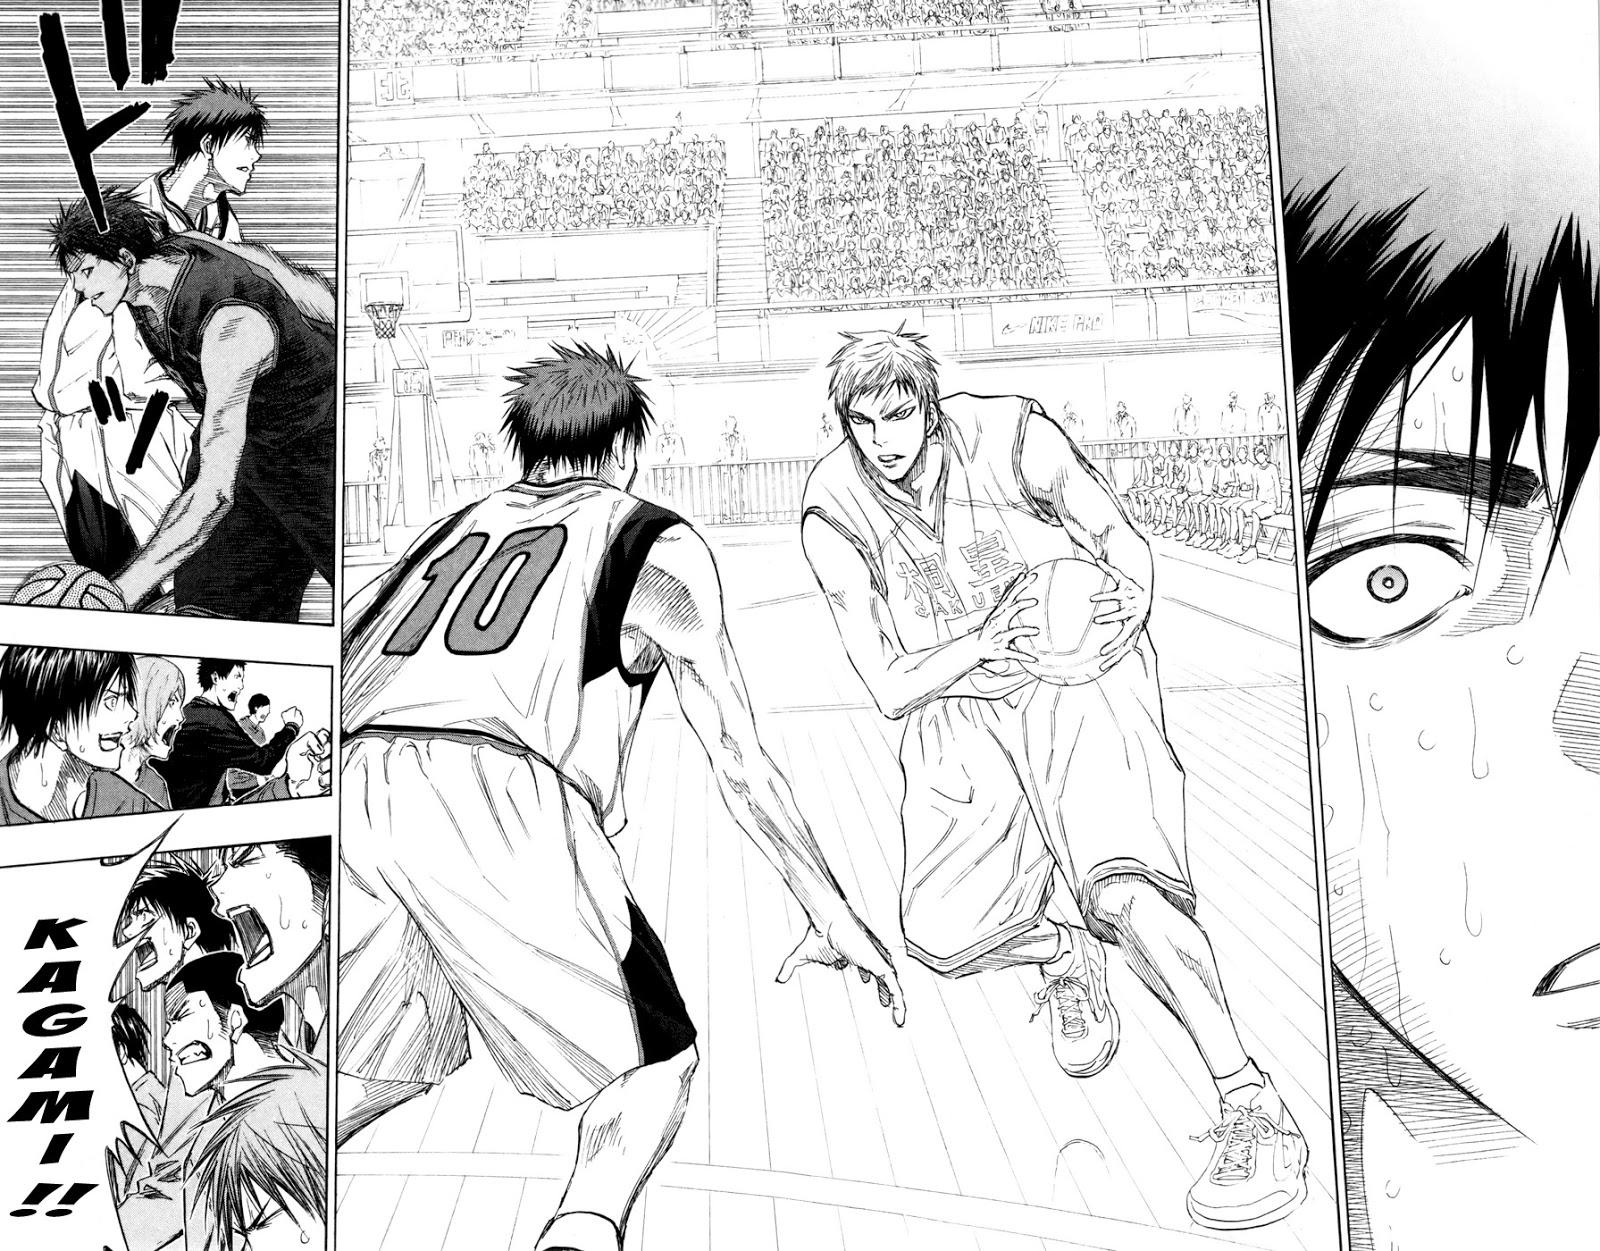 Kuroko no Basket Manga Chapter 135 - Image 16-16